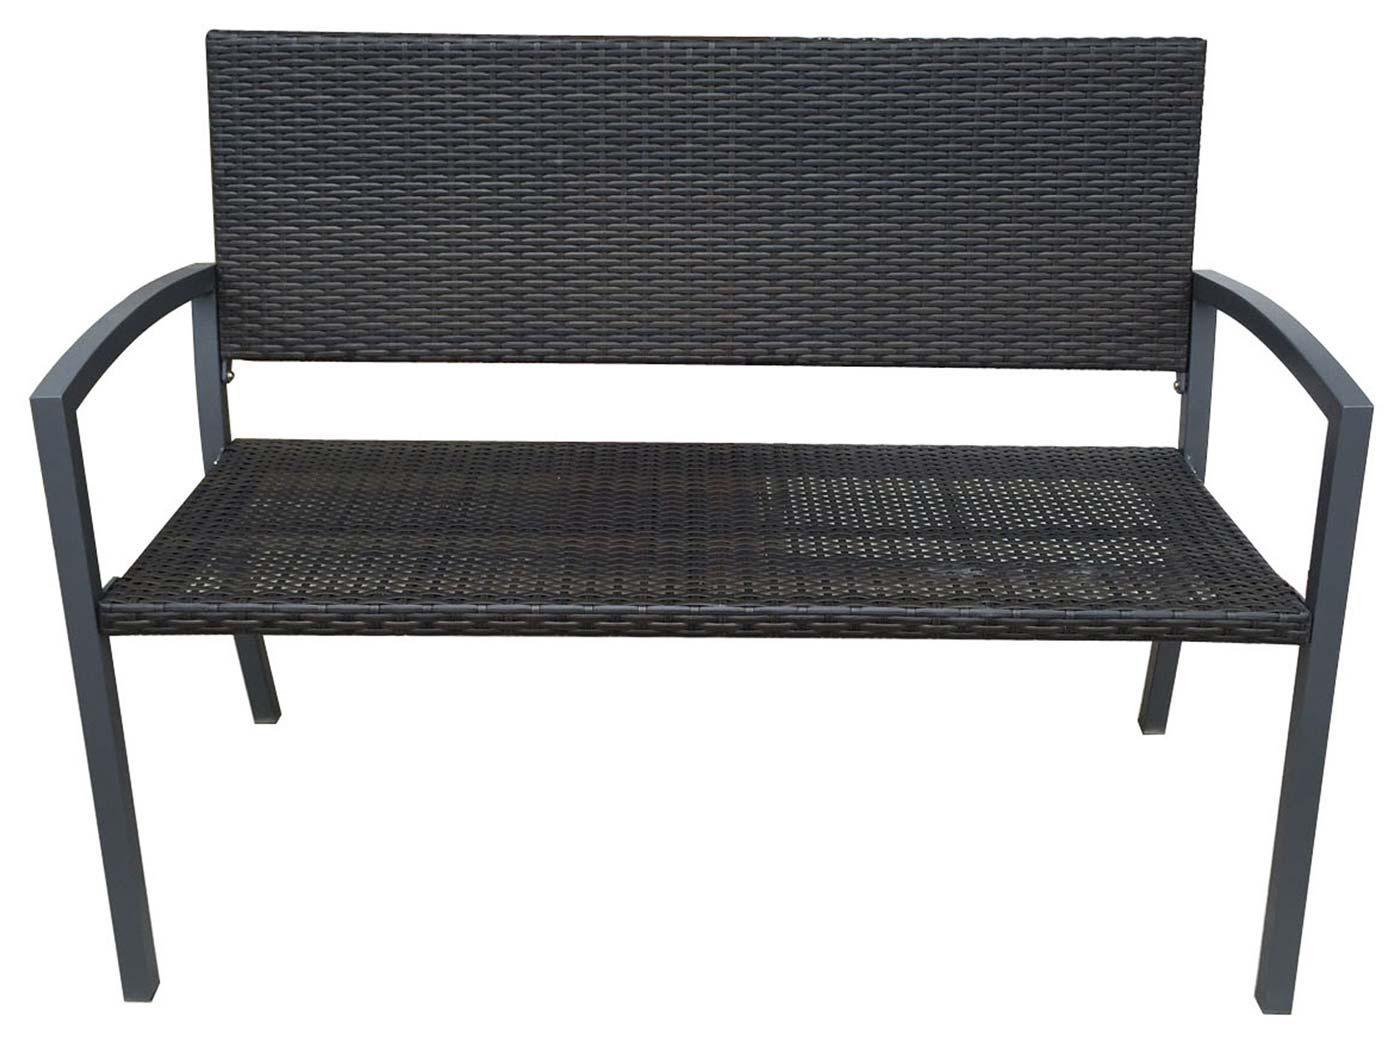 gartenbank fg33 sitzbank bank parkbank poly rattan stahlgestell 100x143x59cm kaufen bei. Black Bedroom Furniture Sets. Home Design Ideas